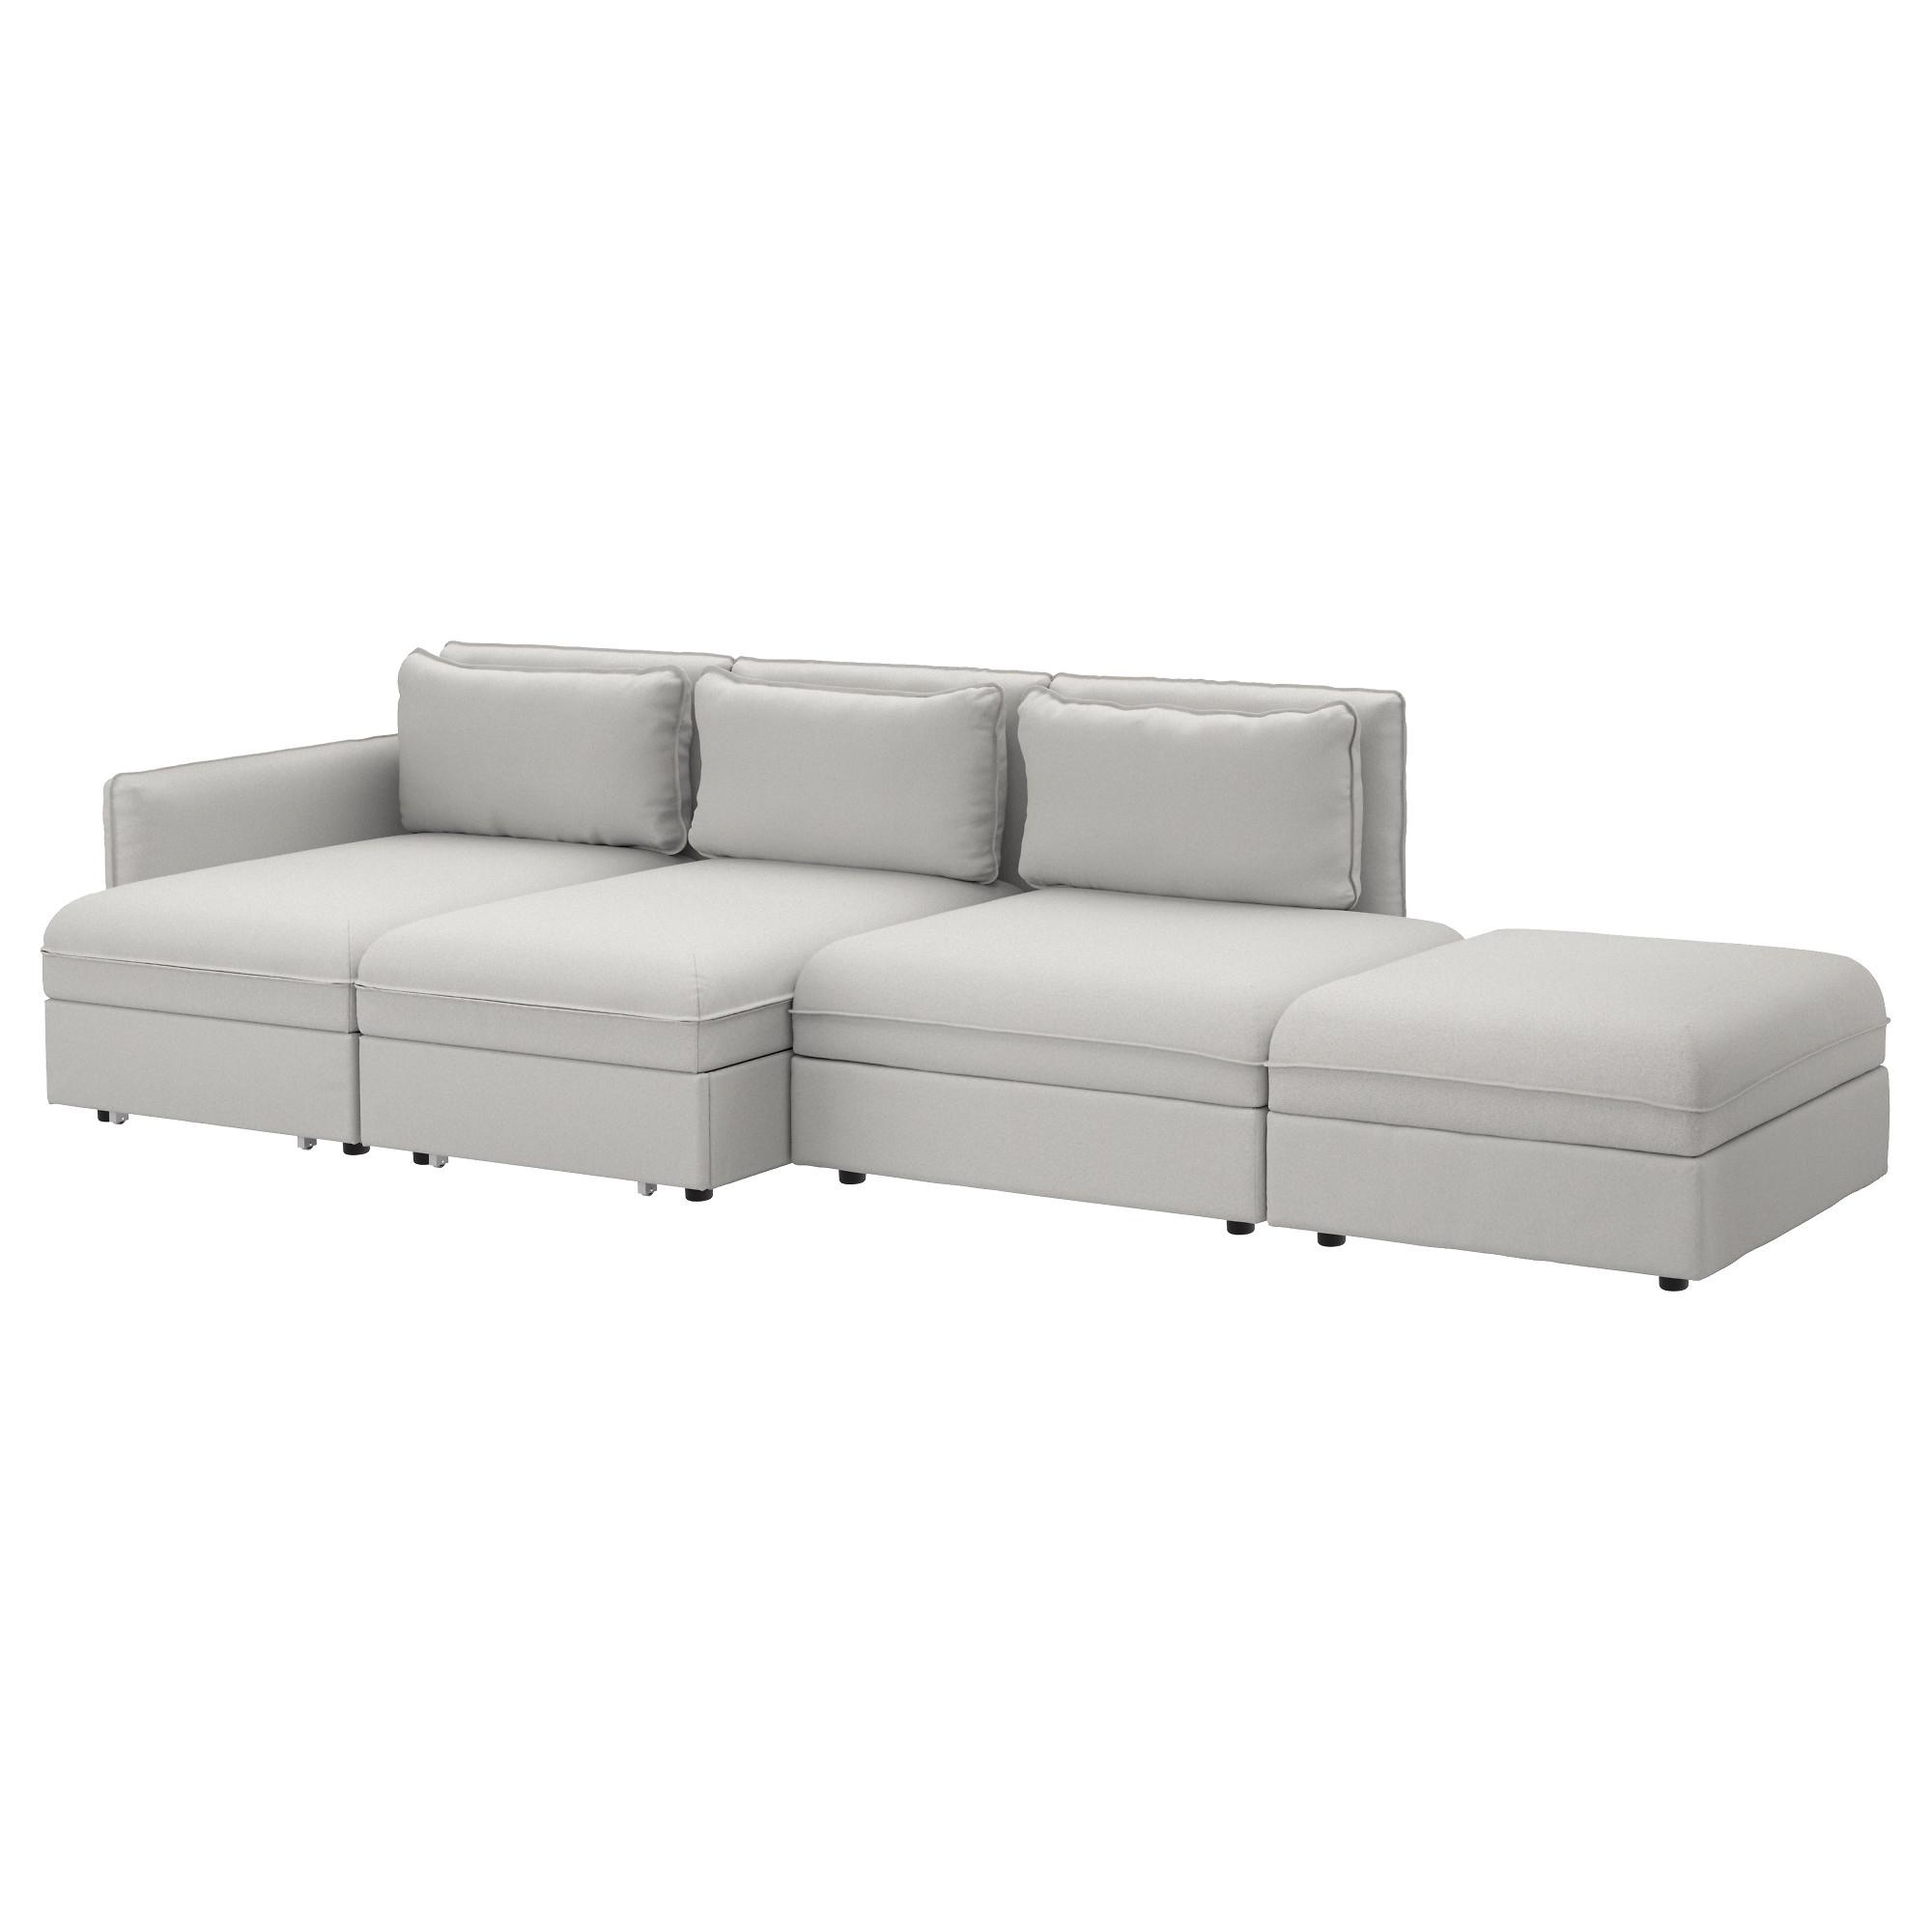 Vallentuna Ikea Avis Unique Galerie Balkarp sofa Beds Ikea Fantastic Design Review Reviews 54 Bed